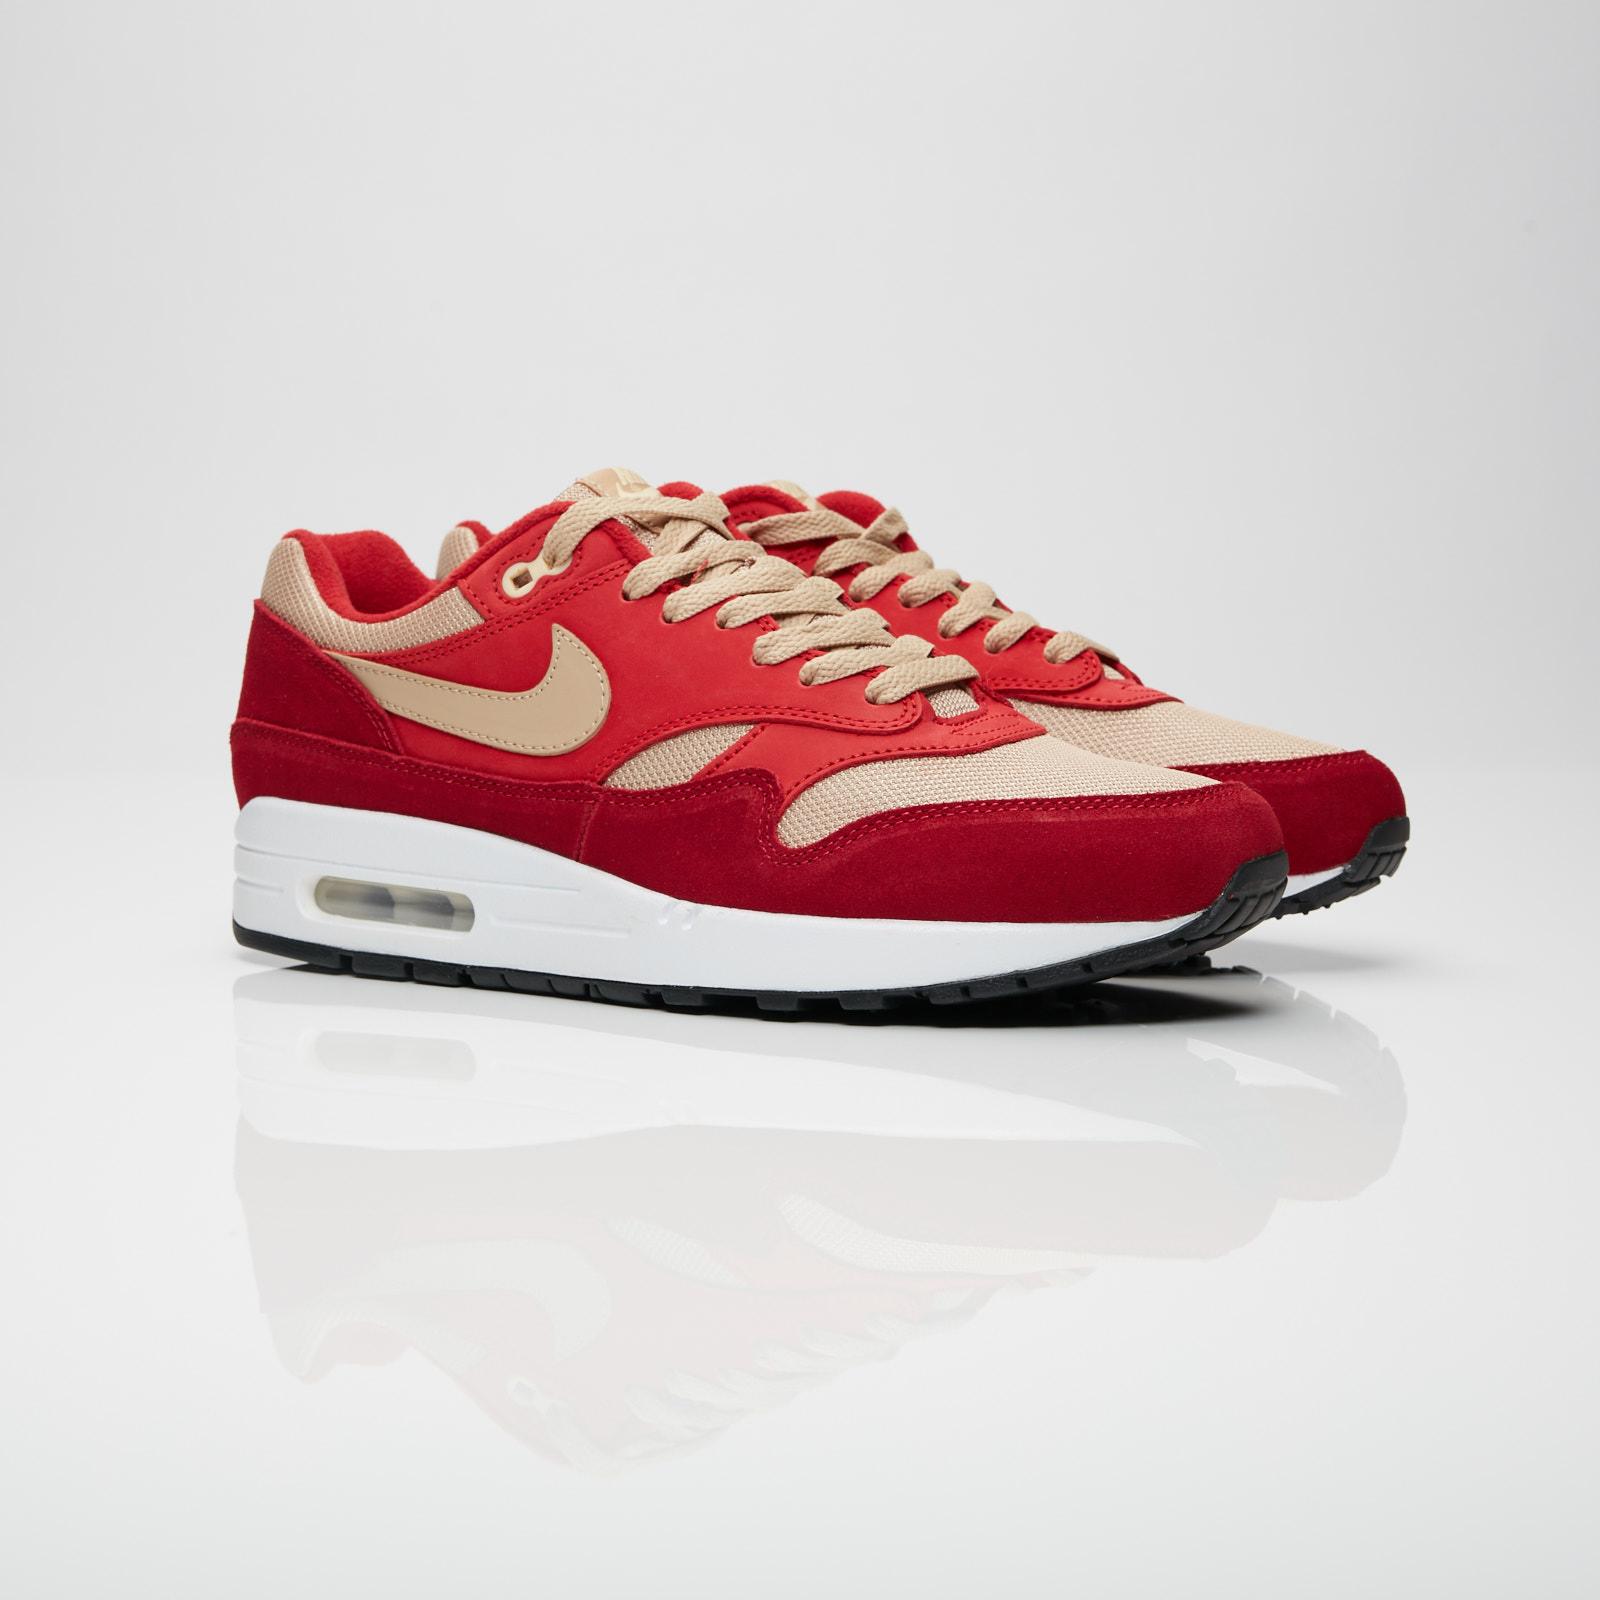 7fa29a657c Nike Air Max 1 Premium Retro - 908366-600 - Sneakersnstuff ...